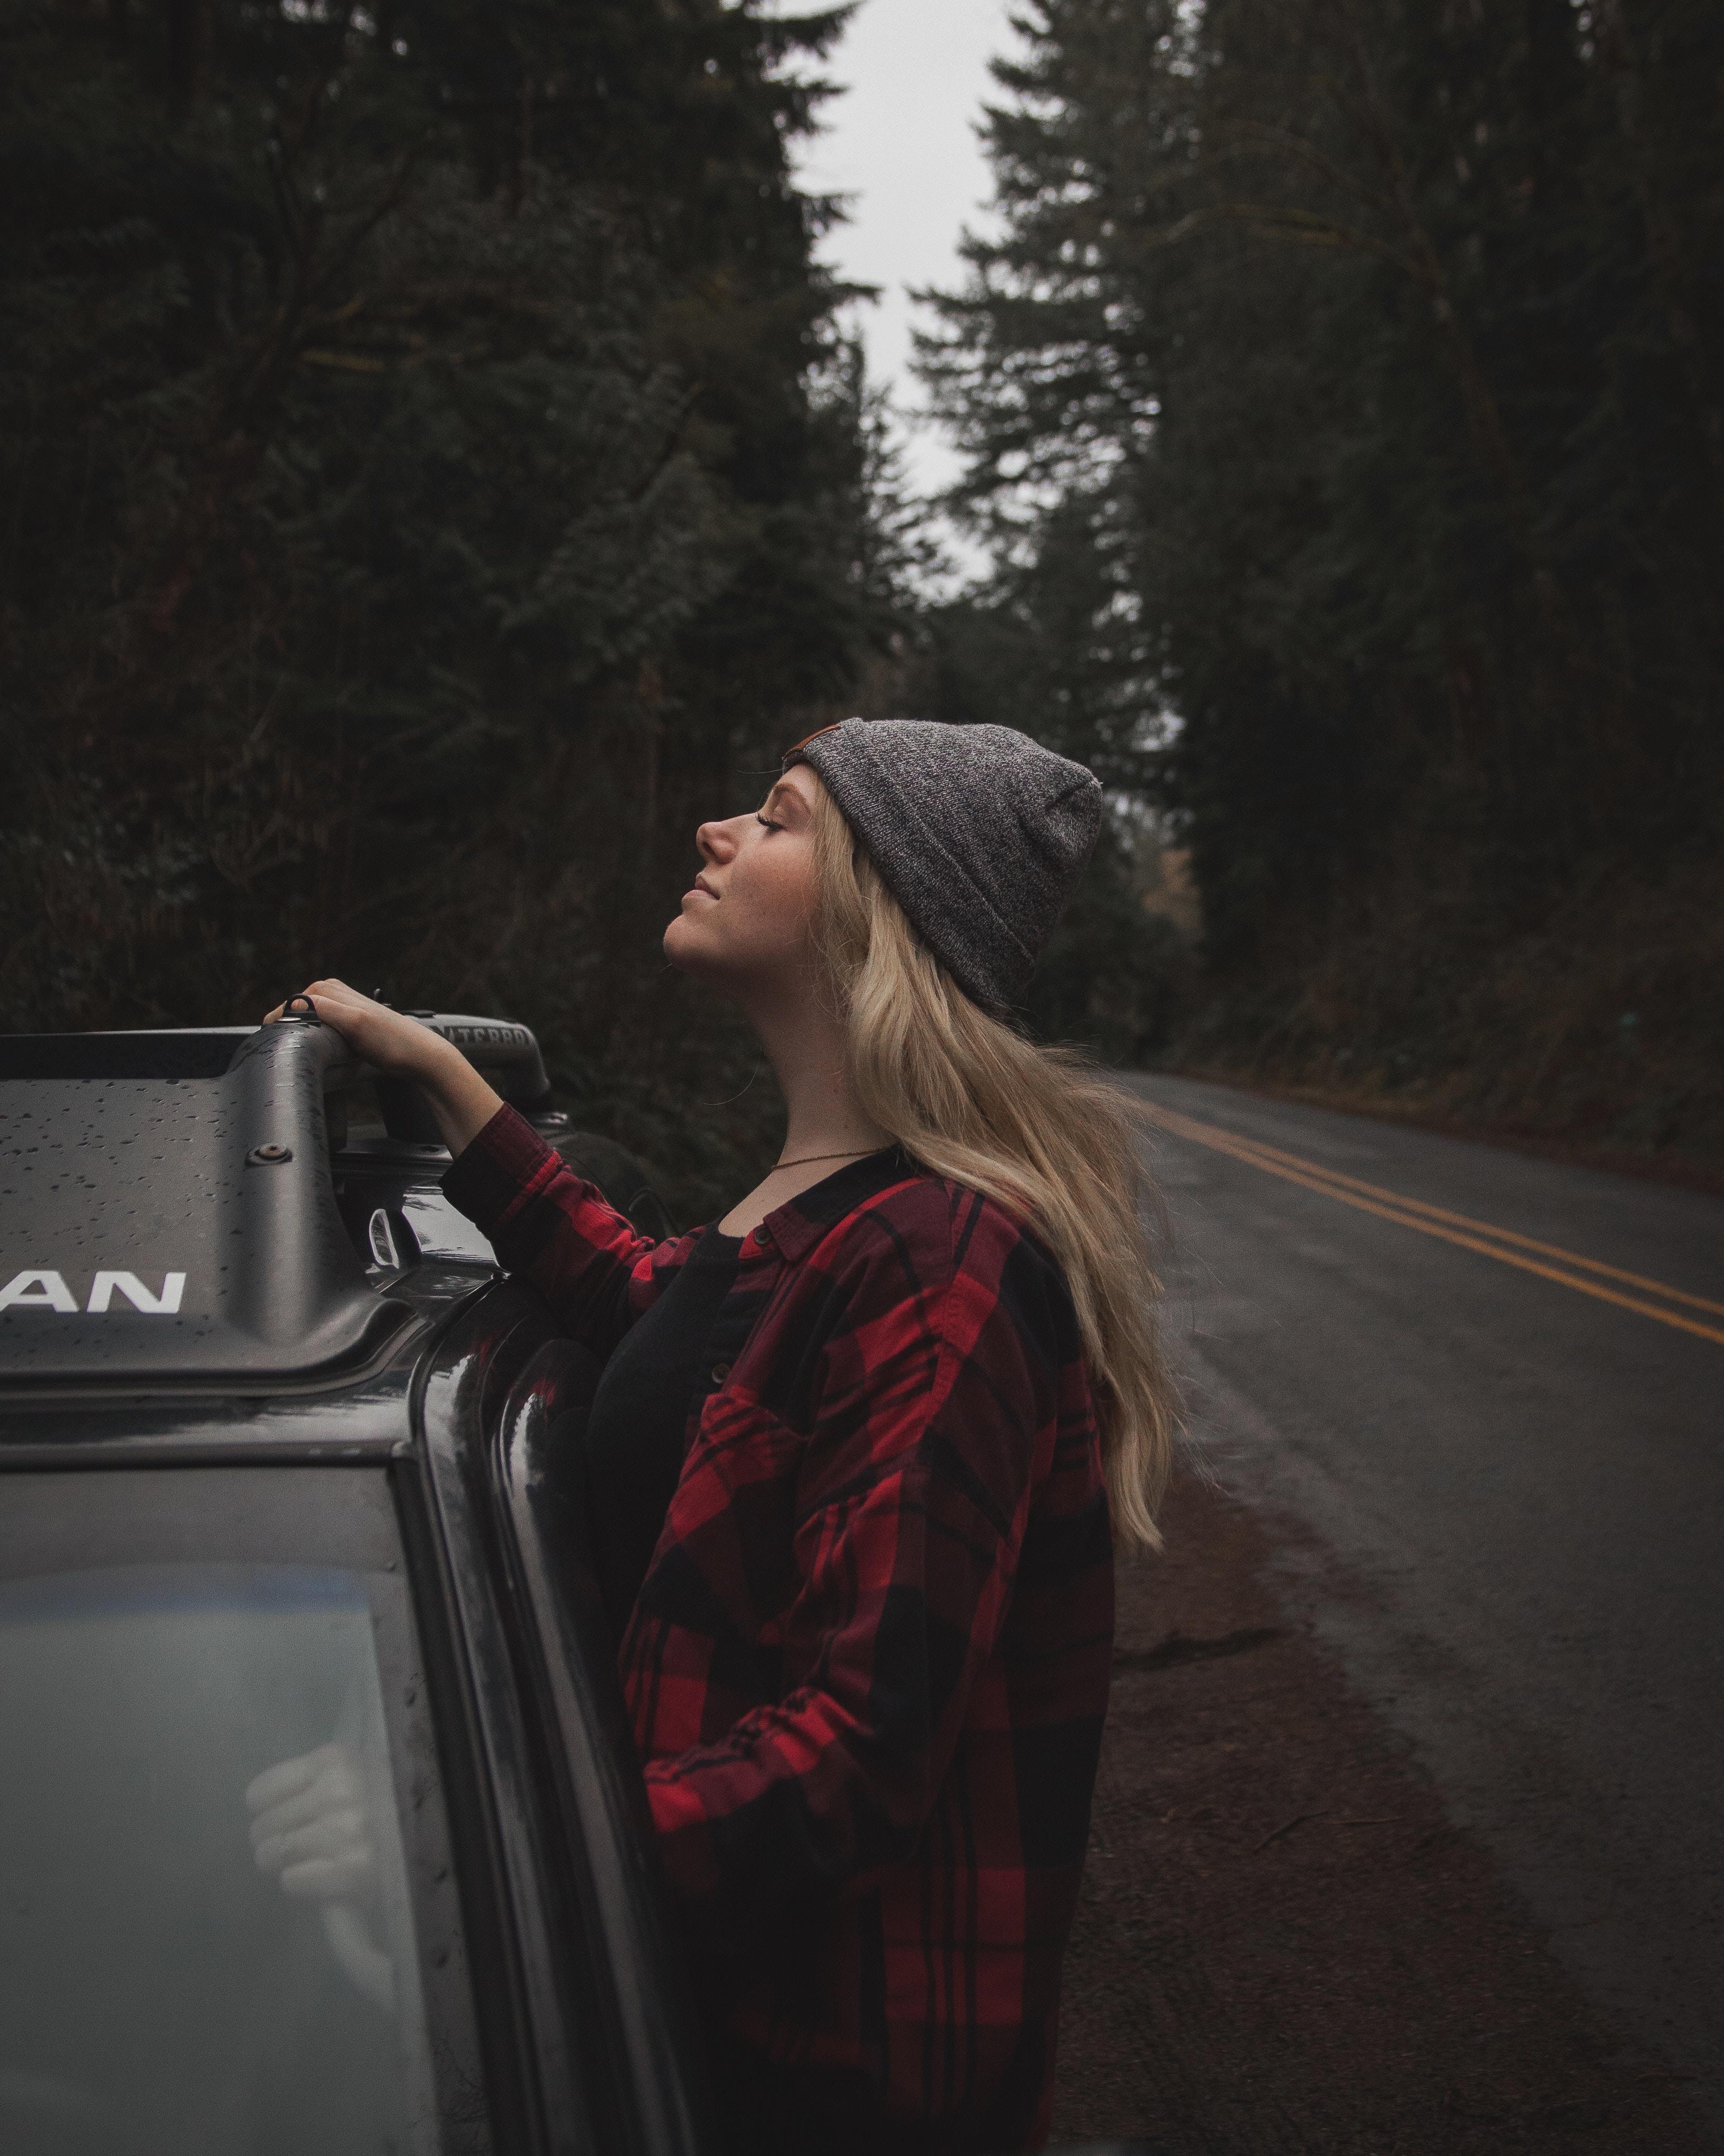 woman peeking outside vehicle